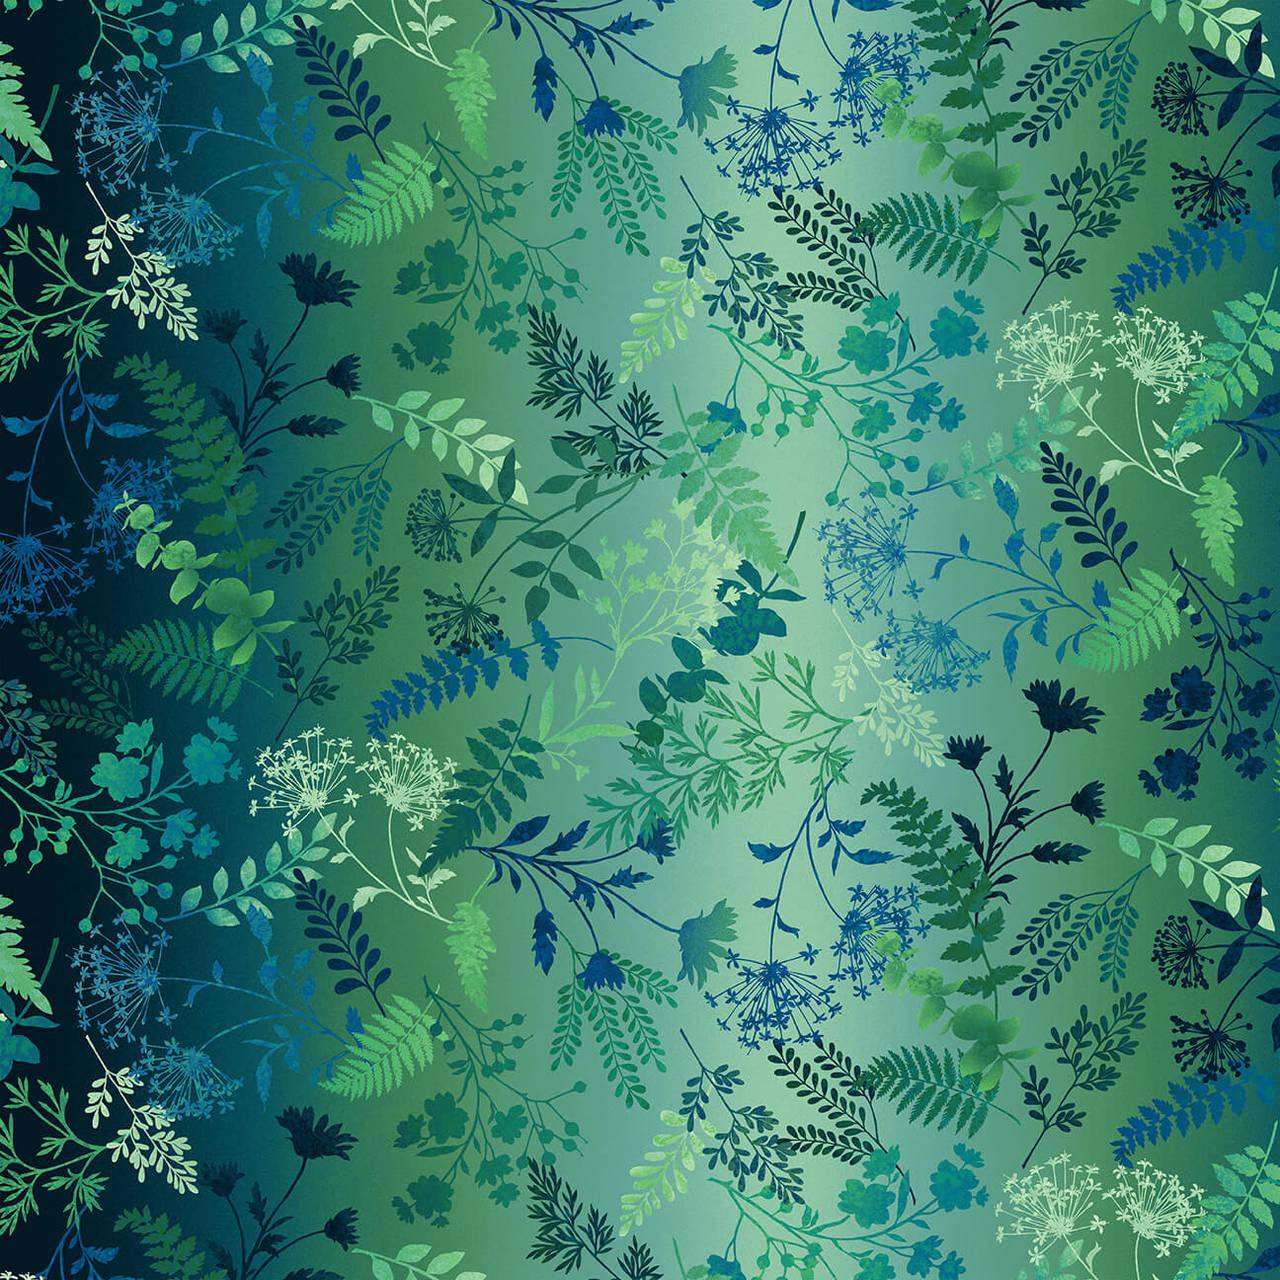 Woodland Wonders 4870-77 Navy Wildflower Ombre